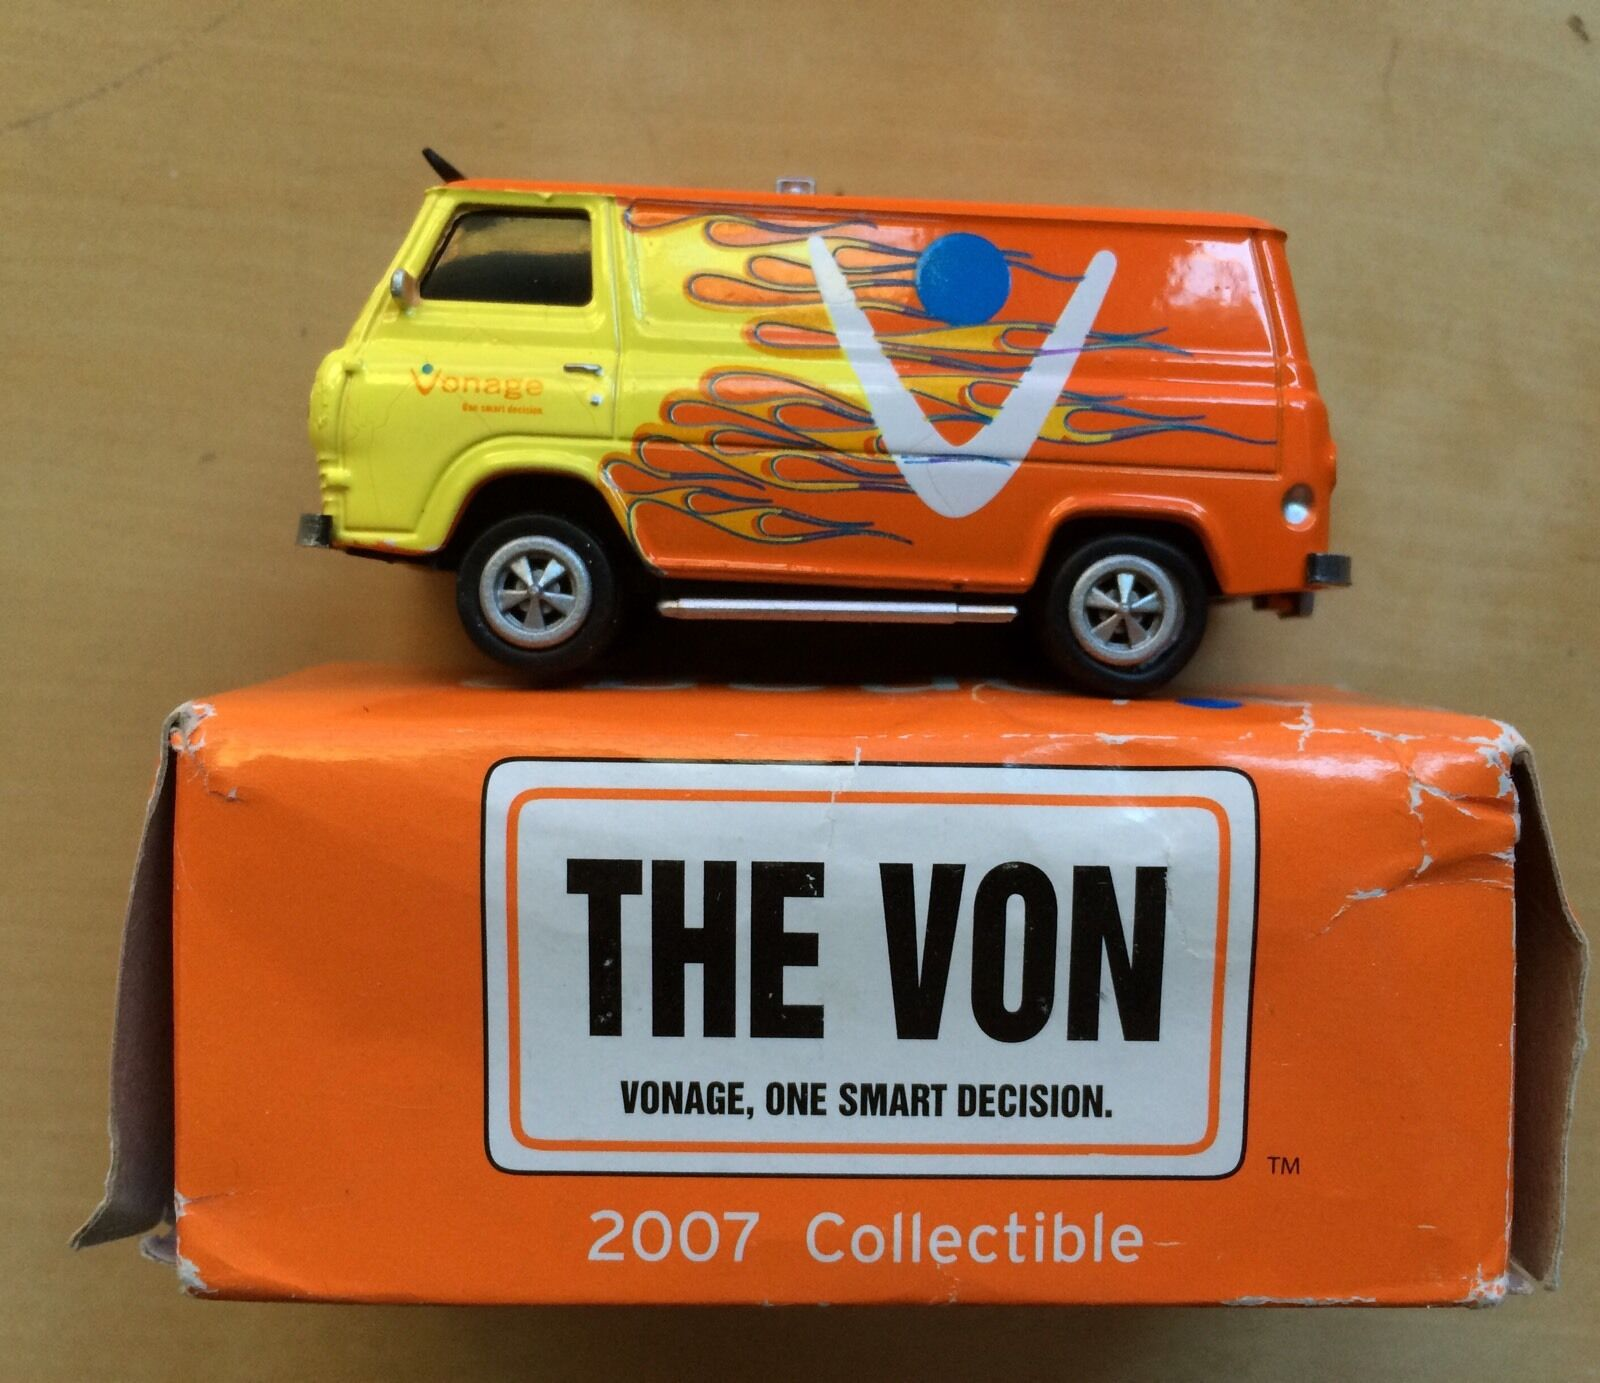 2007 Diecast Coleccionables Vonage el von Coche Camioneta en caja Rare Hot Wheels Matchbox